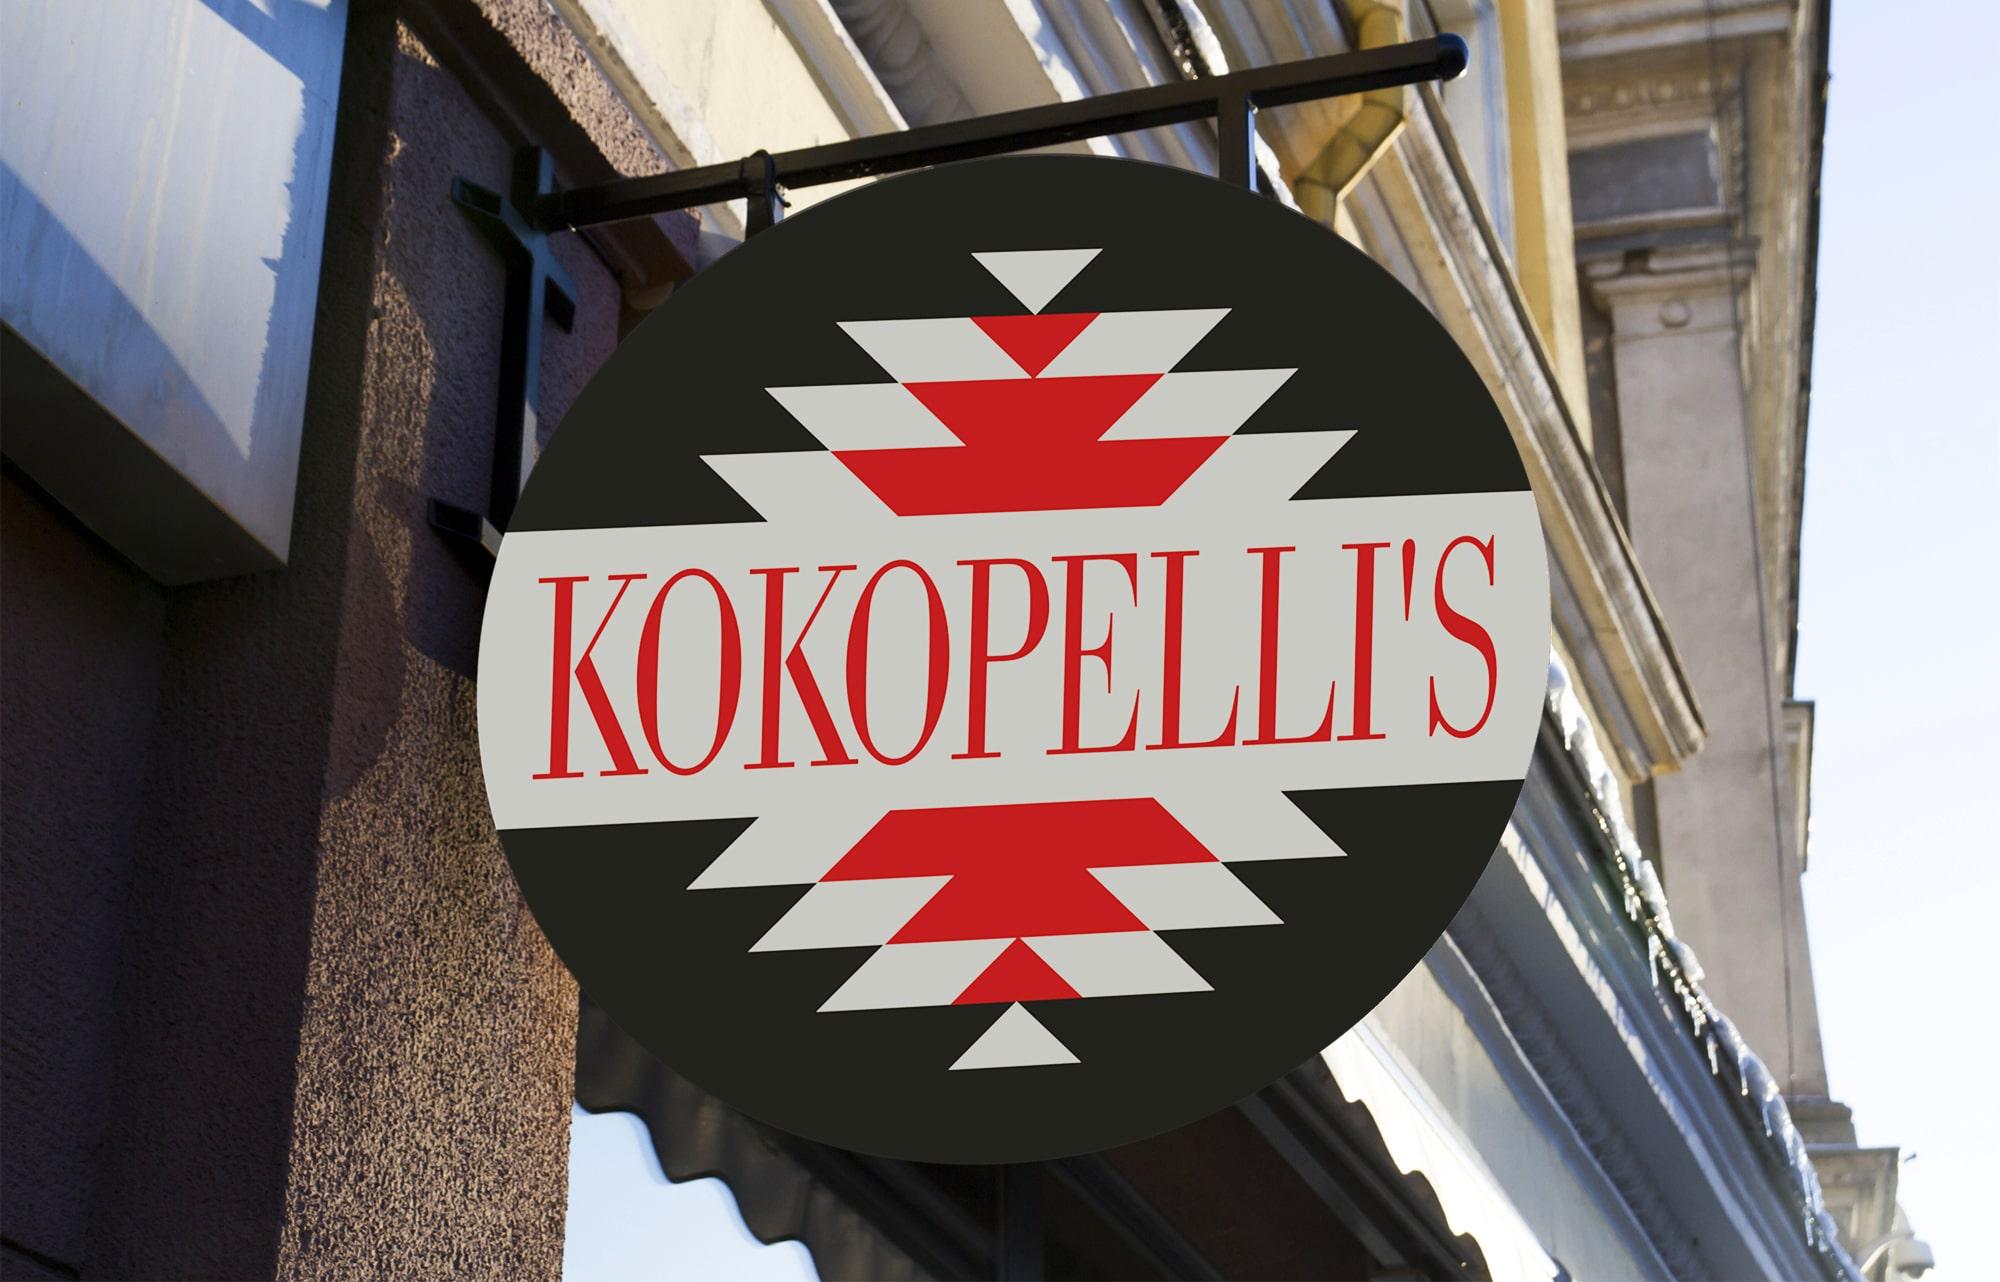 store sign for Kokopelli's